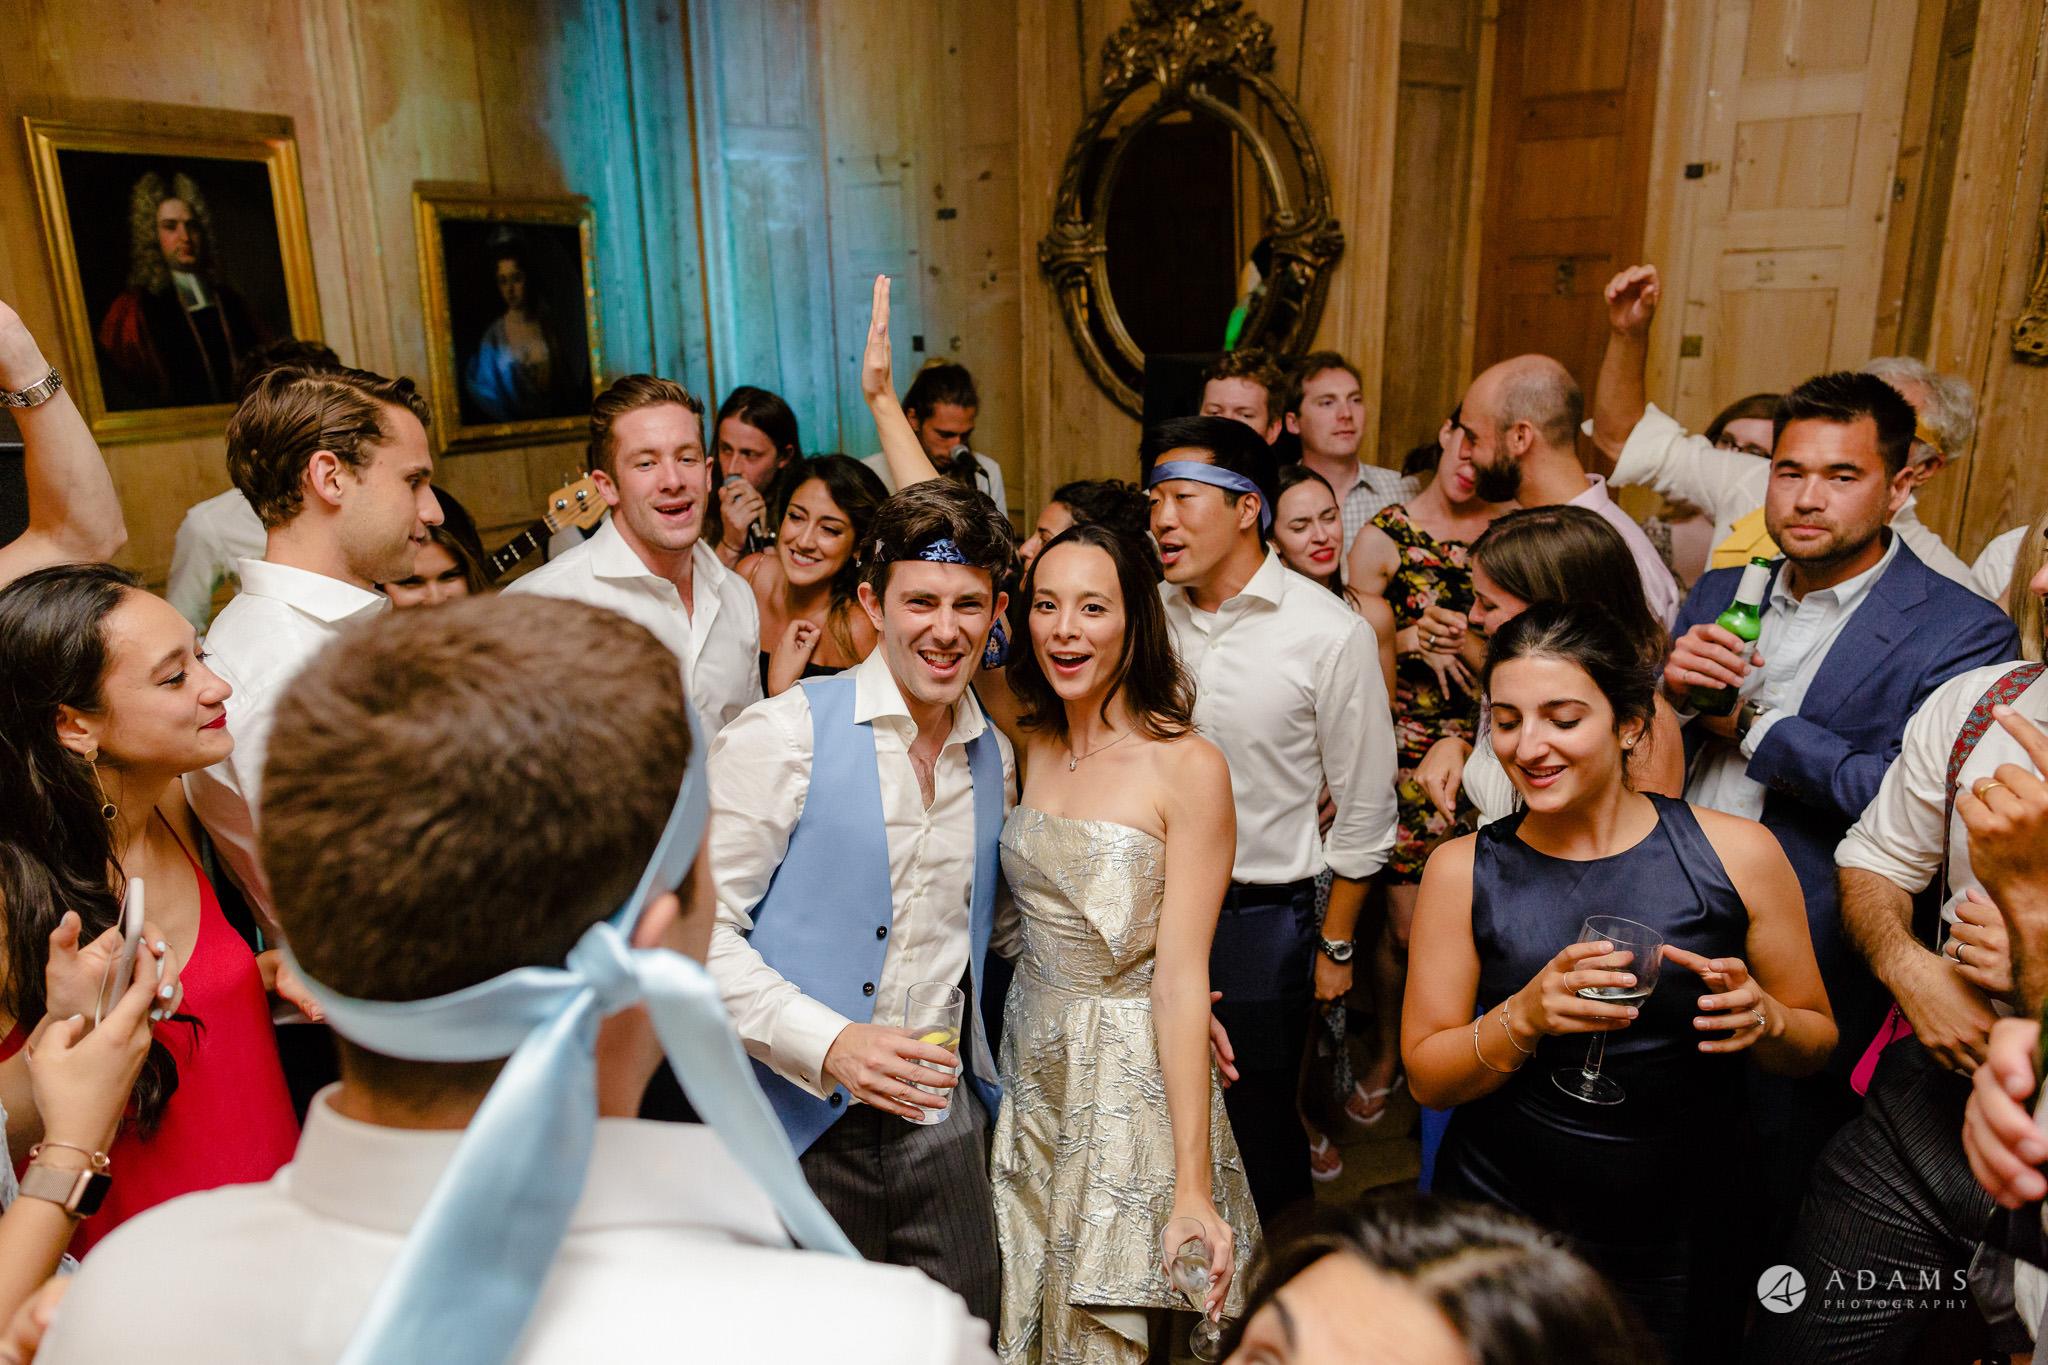 Trinity College Cambridge wedding party